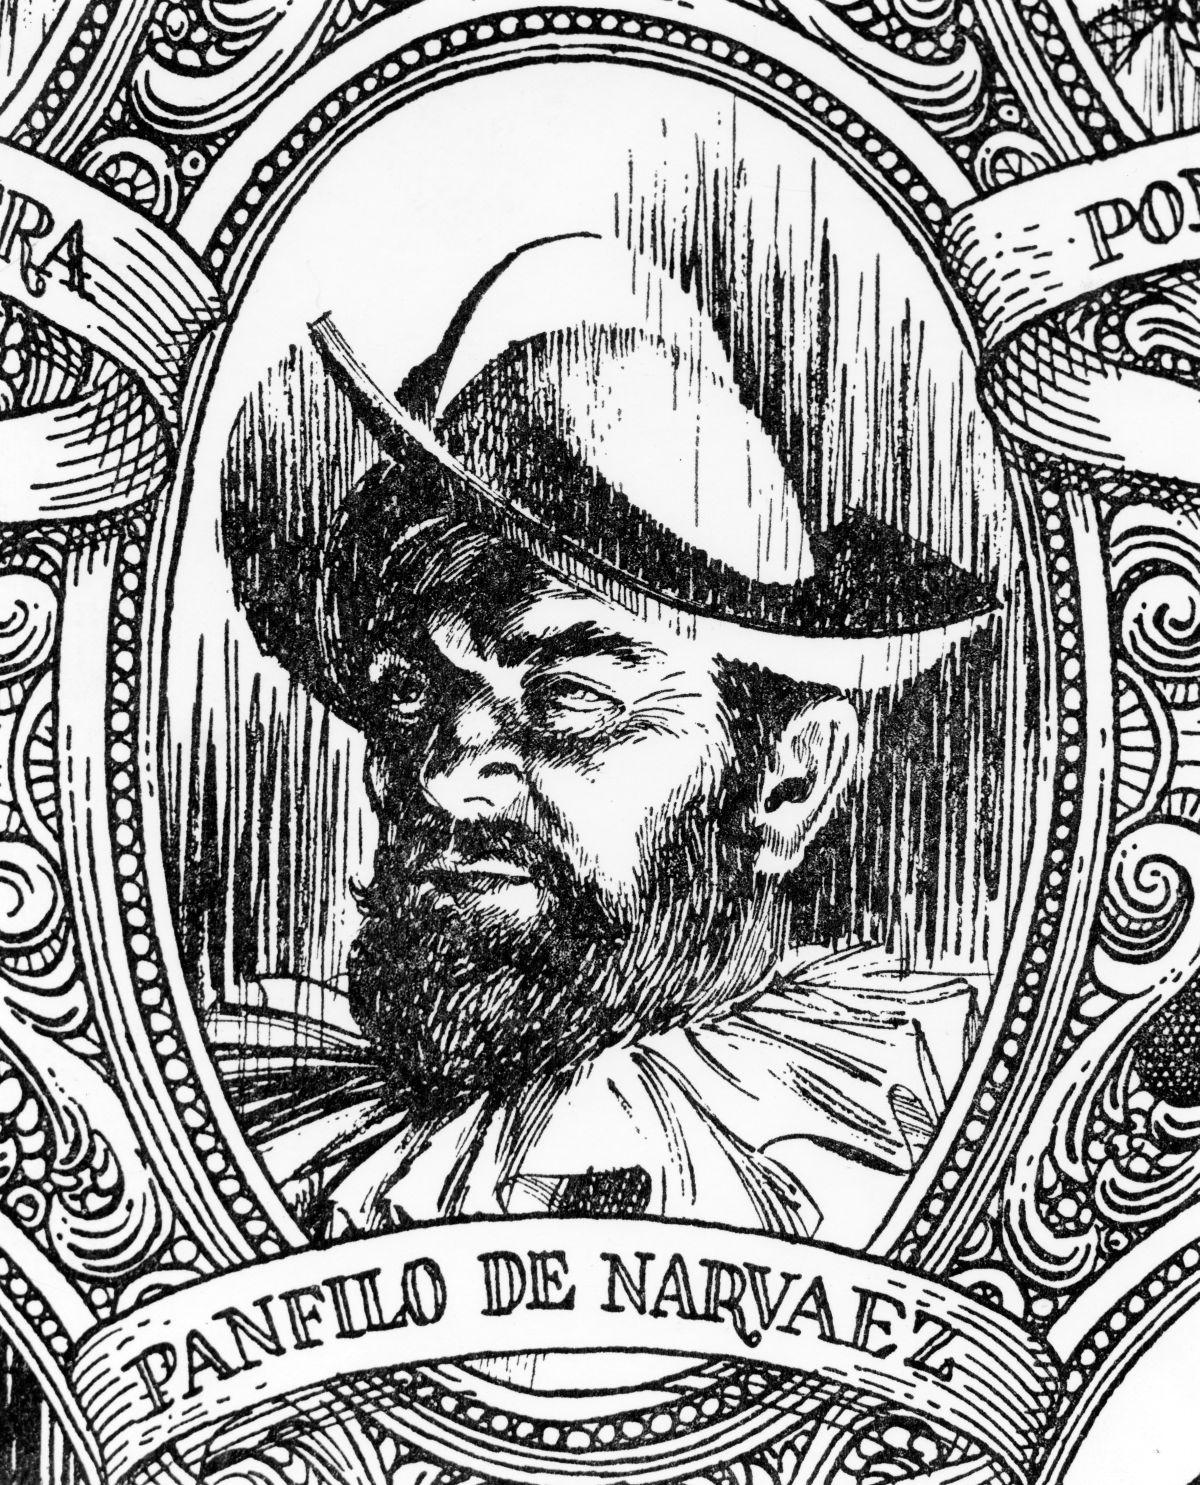 Panfilo de Narvaez.jpg